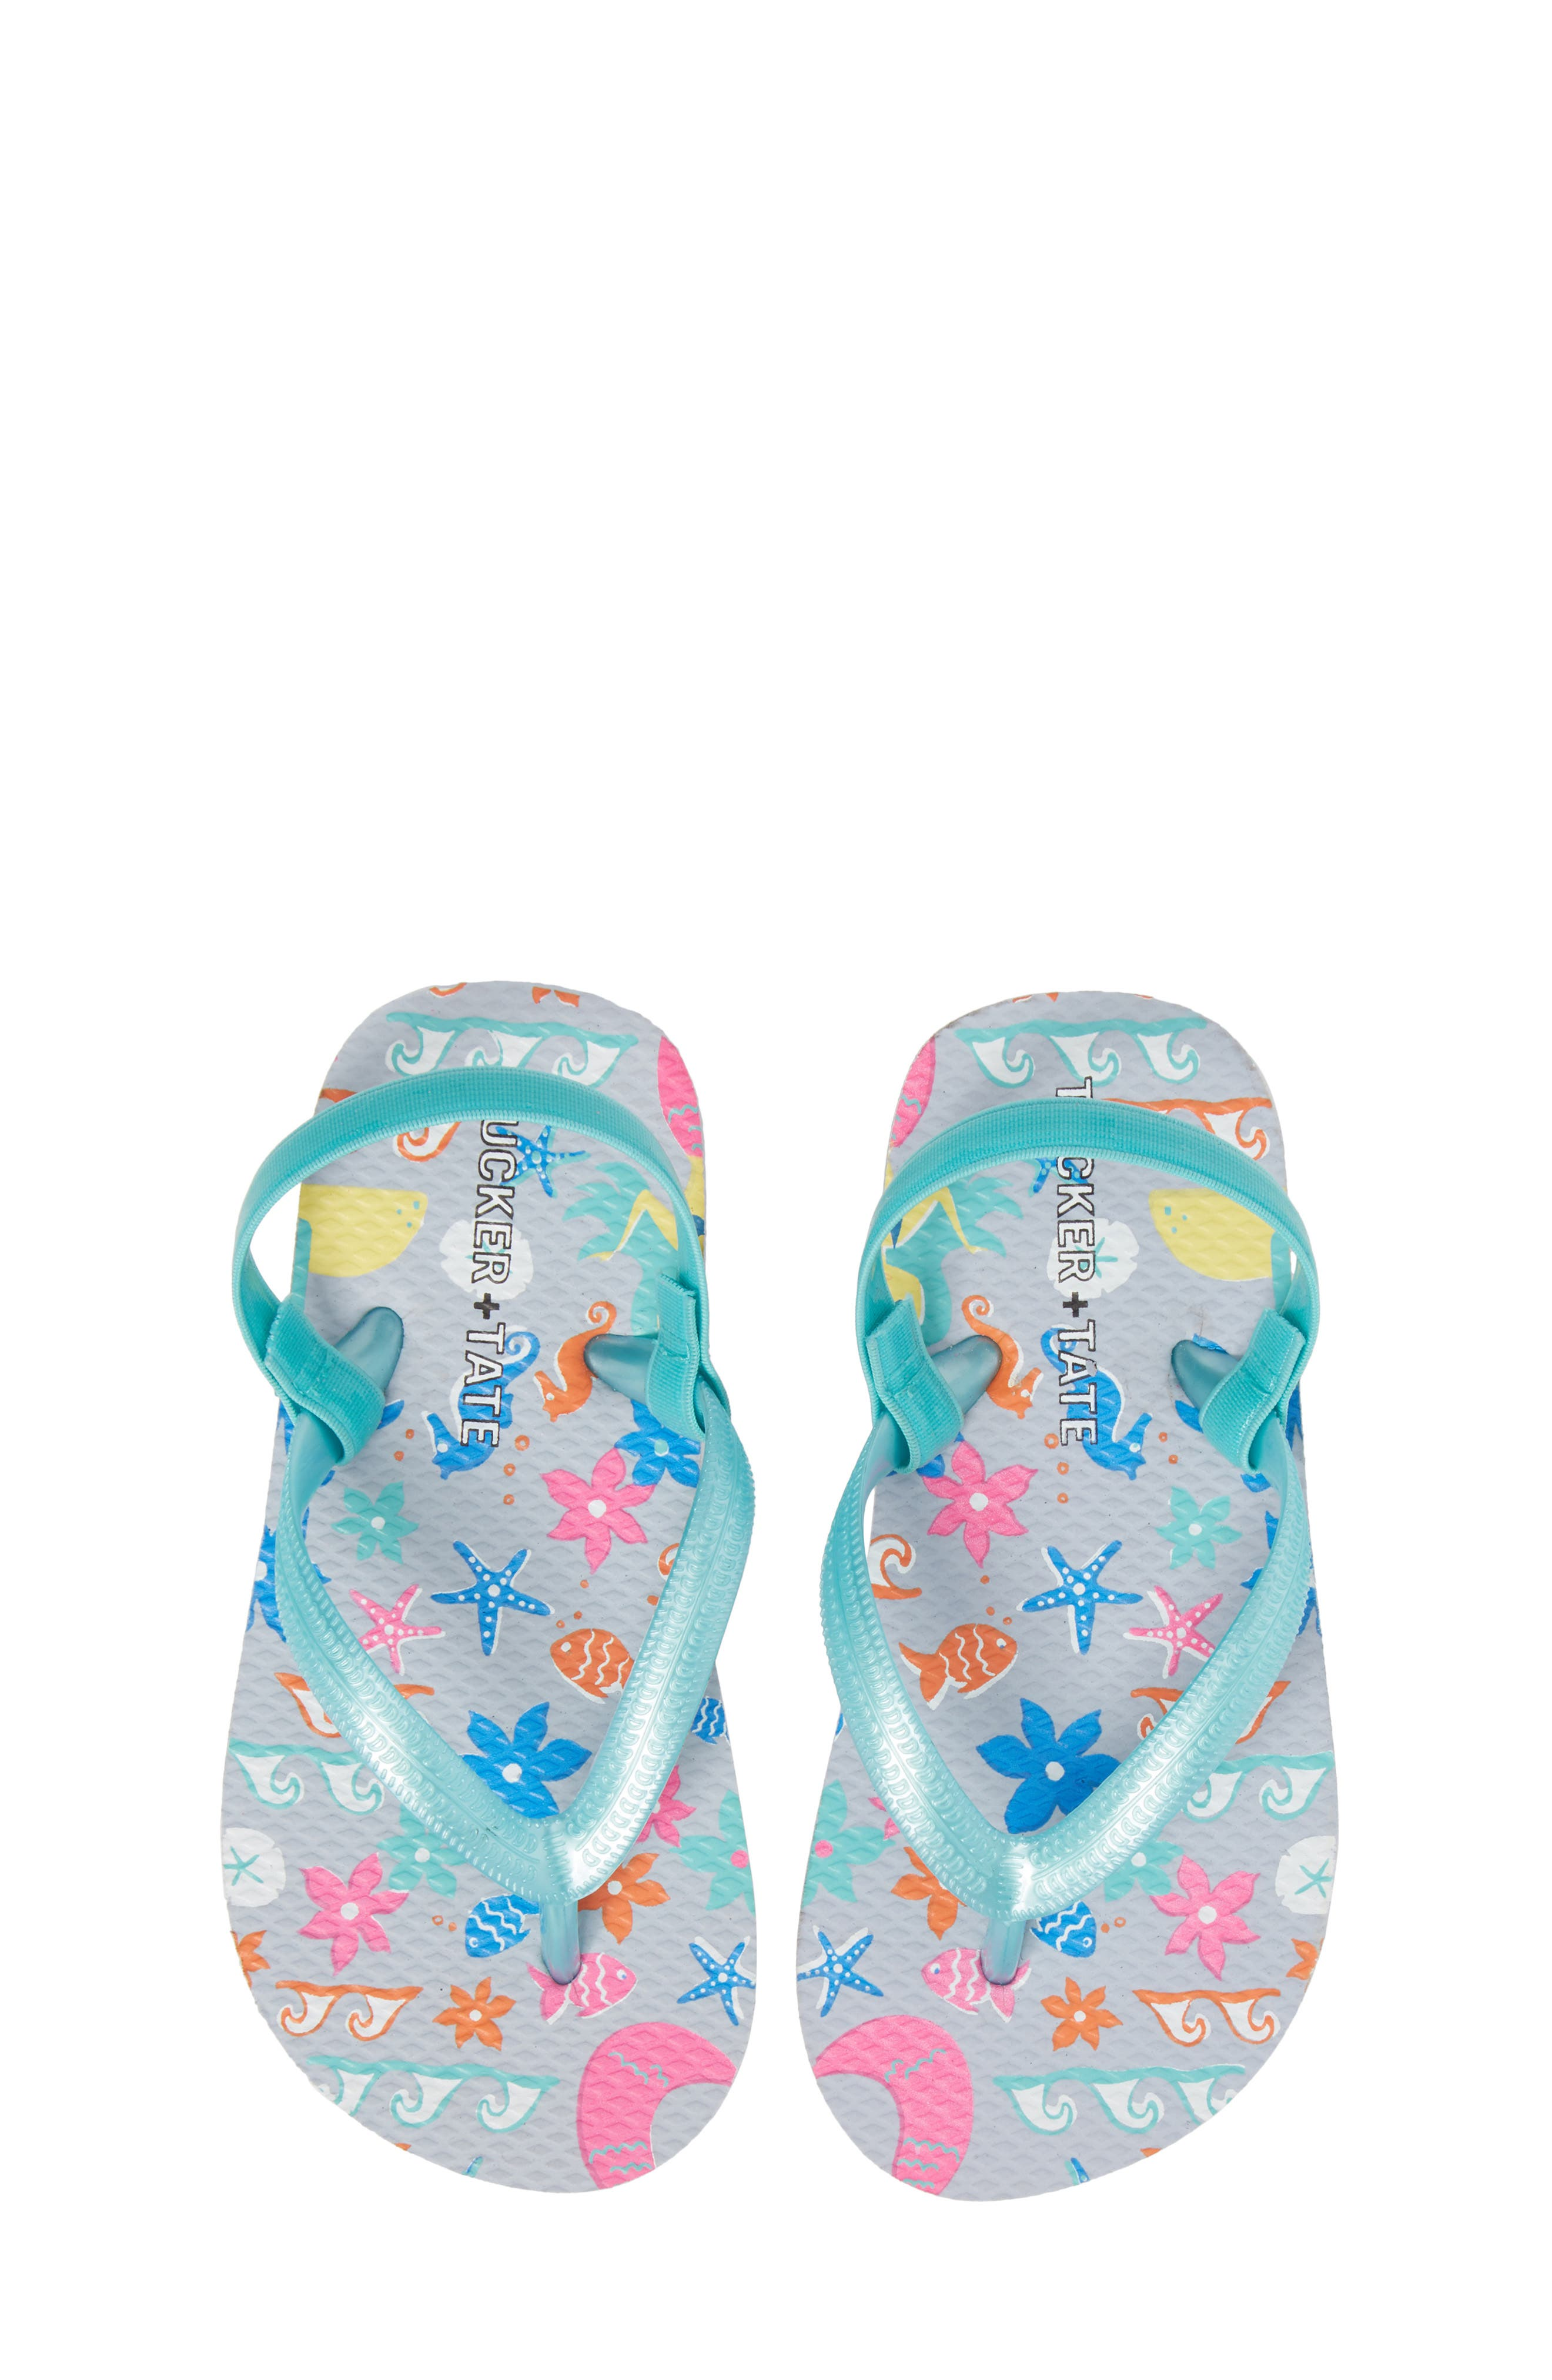 Annabelle Flip Flop,                         Main,                         color, Turquoise Mermaid